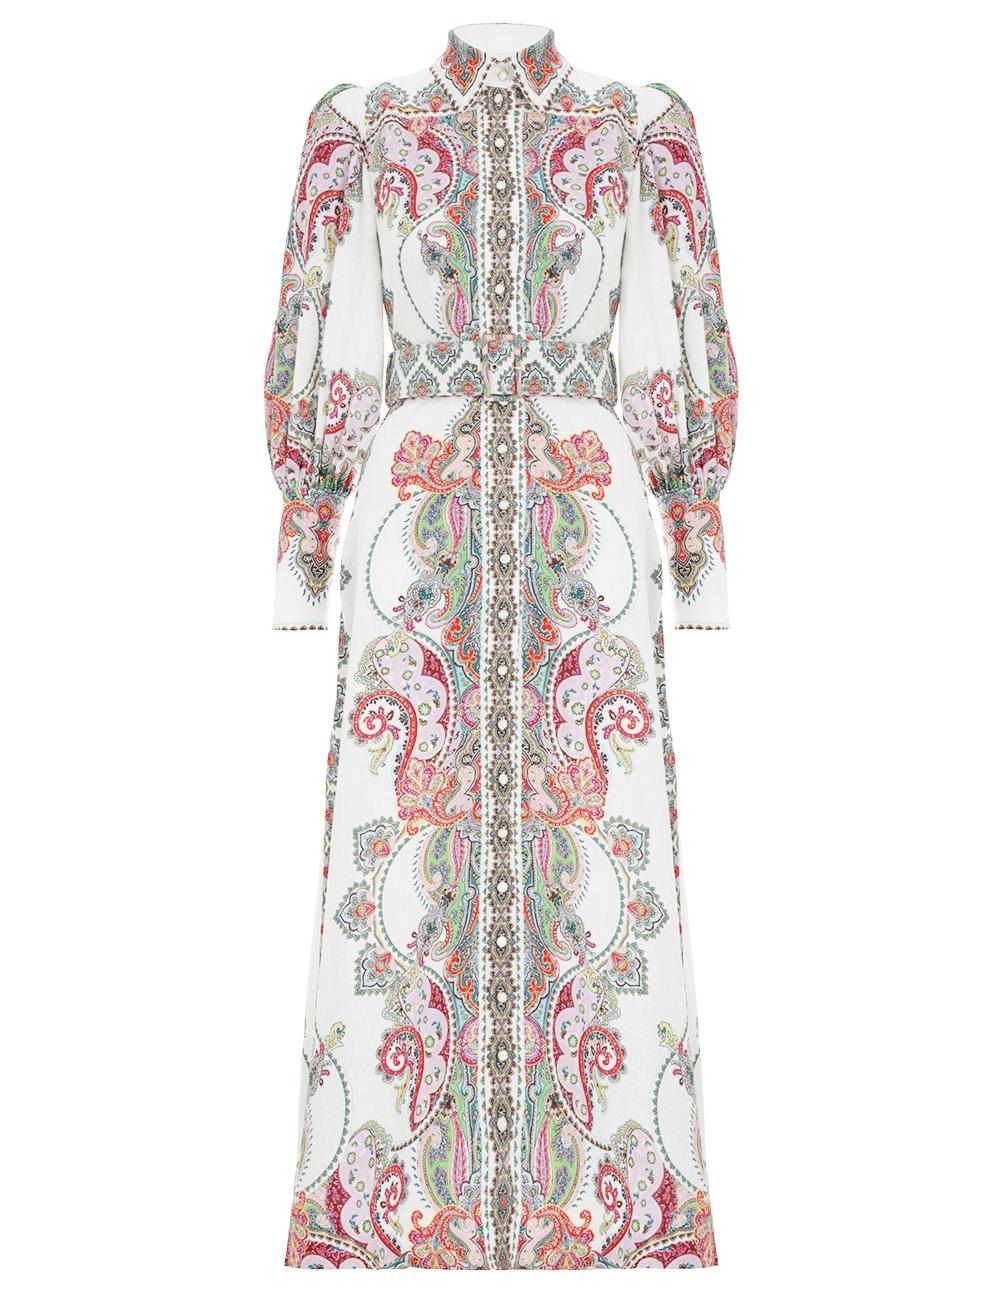 Ninety-Six Filigree Dress